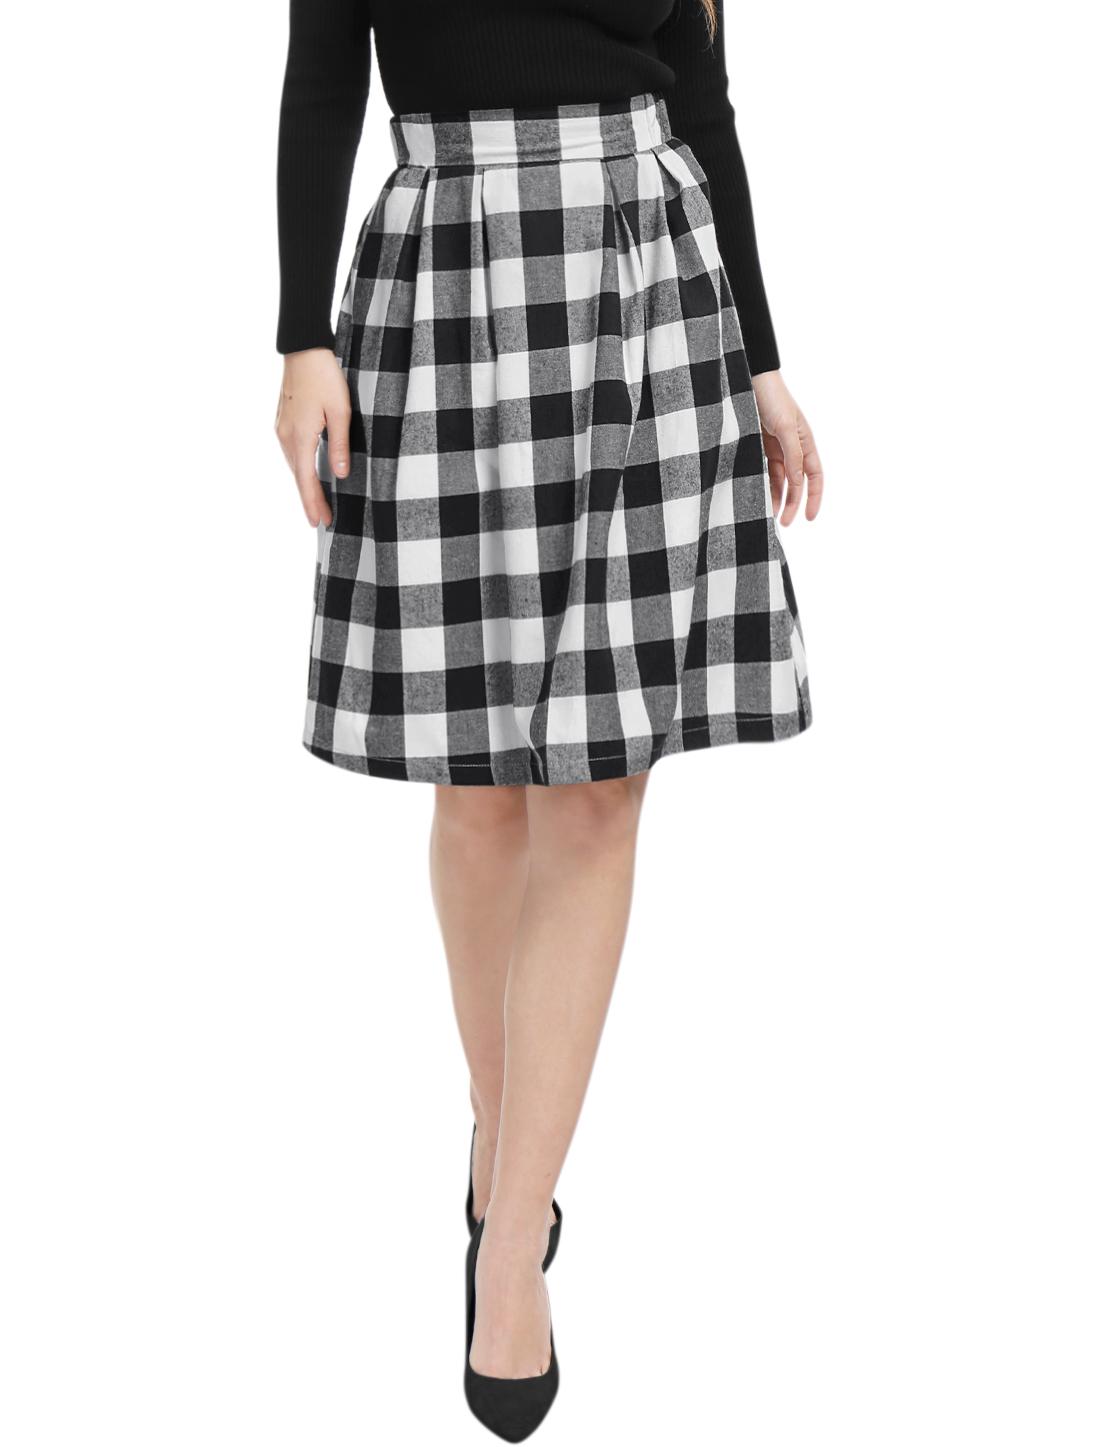 Women Inverted Pleats A-line Check Print Knee Length Skirt Black M